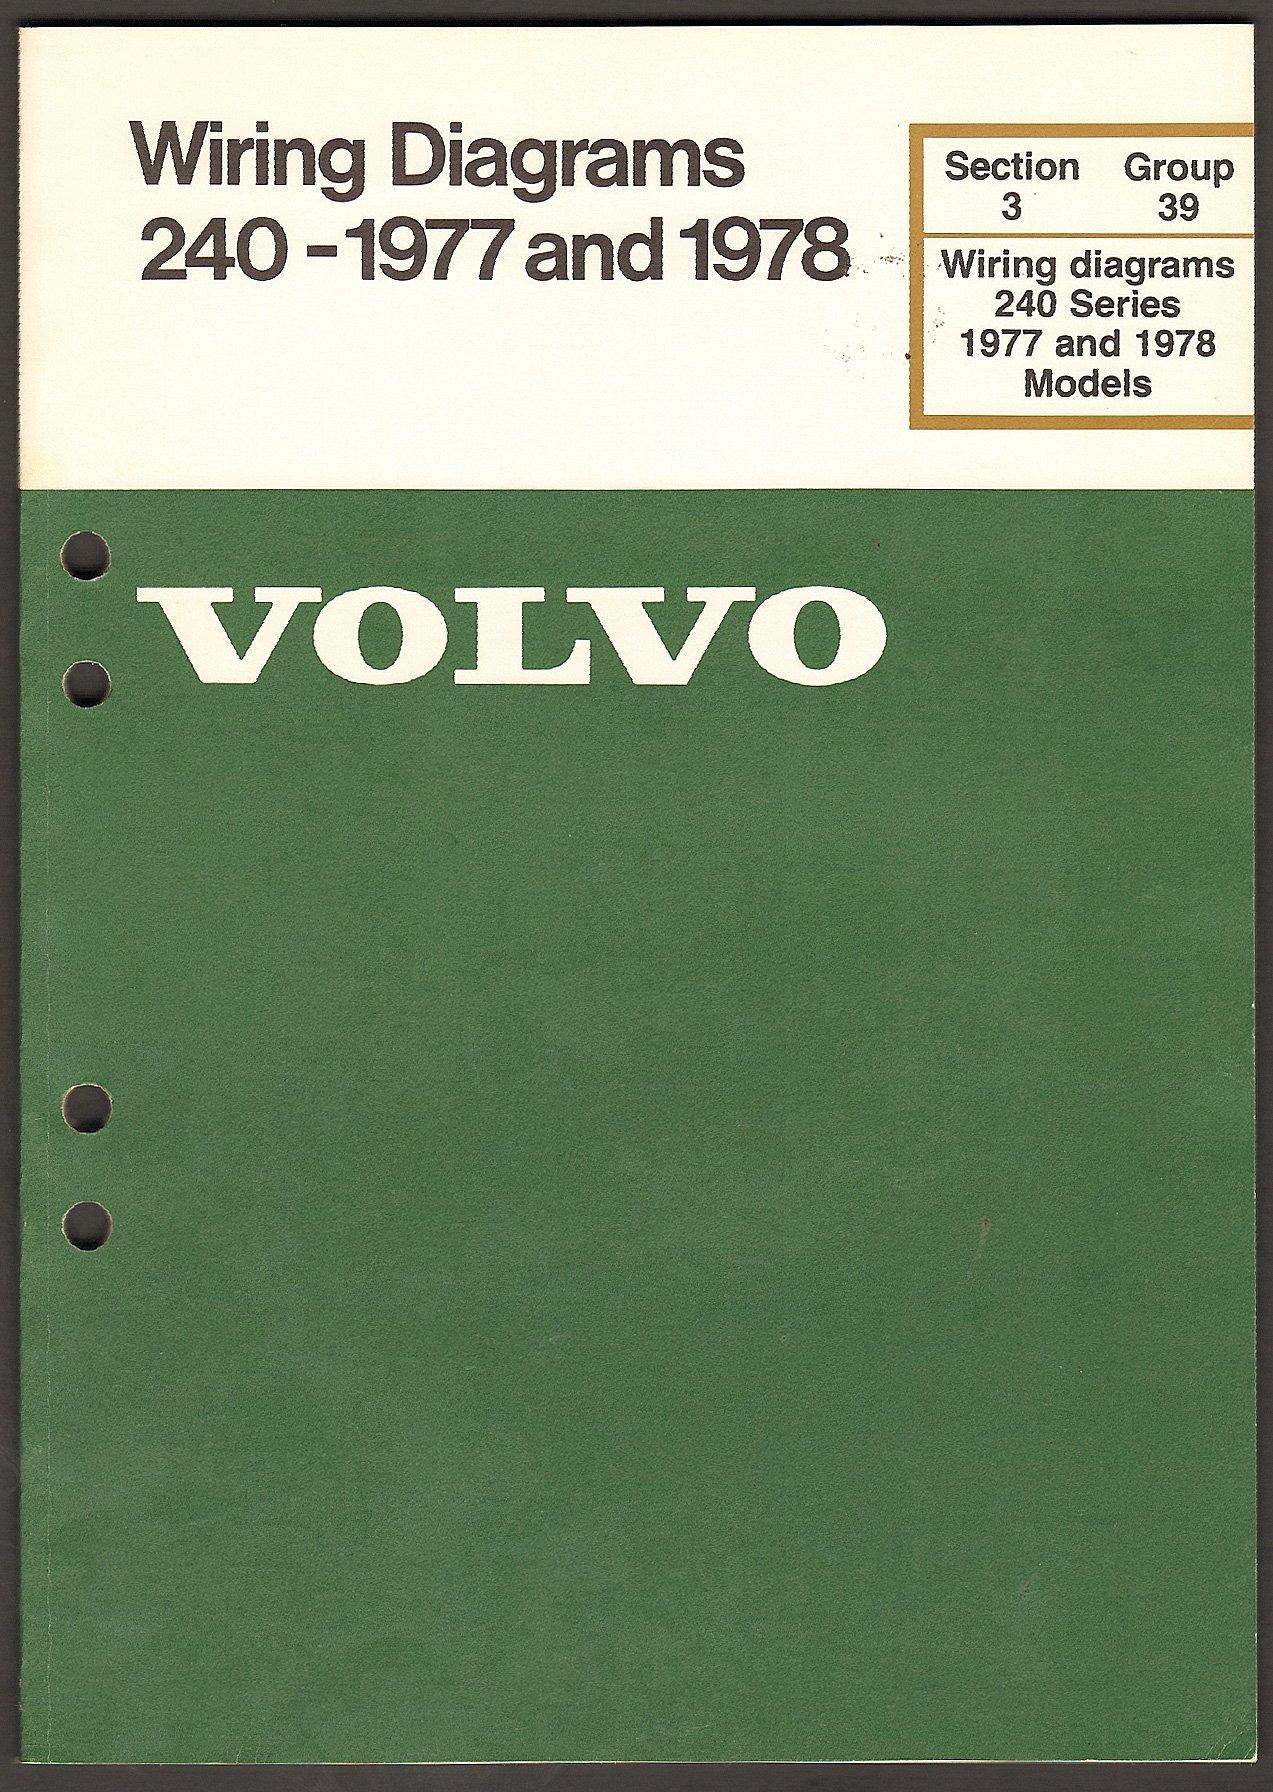 1978 Volvo 245 Wiring Diagram Electrical Diagrams Subaru Brat Series 240 1977 And Amazon Com Books